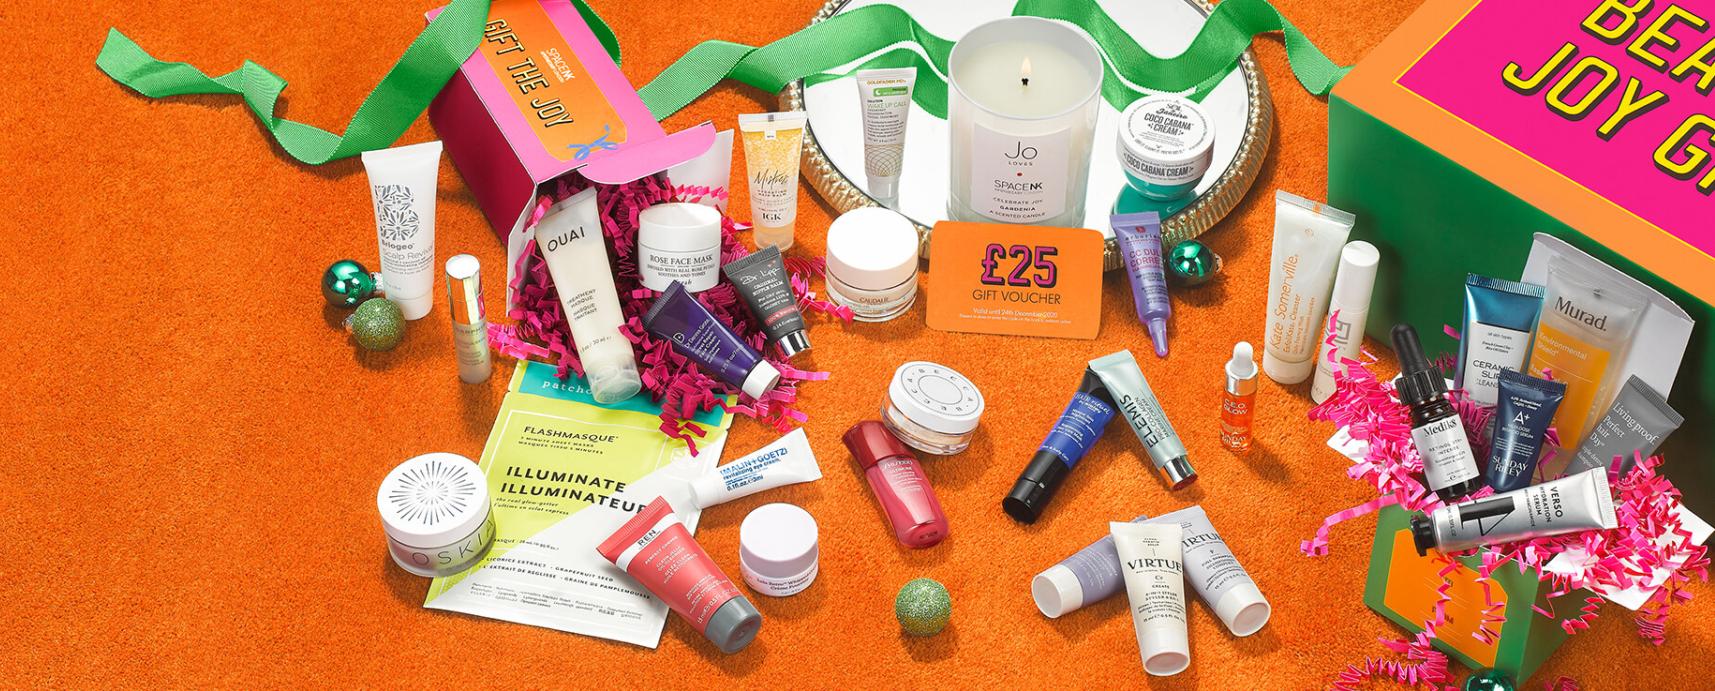 SpaceNK The Beauty Joy Gift GWP 2020